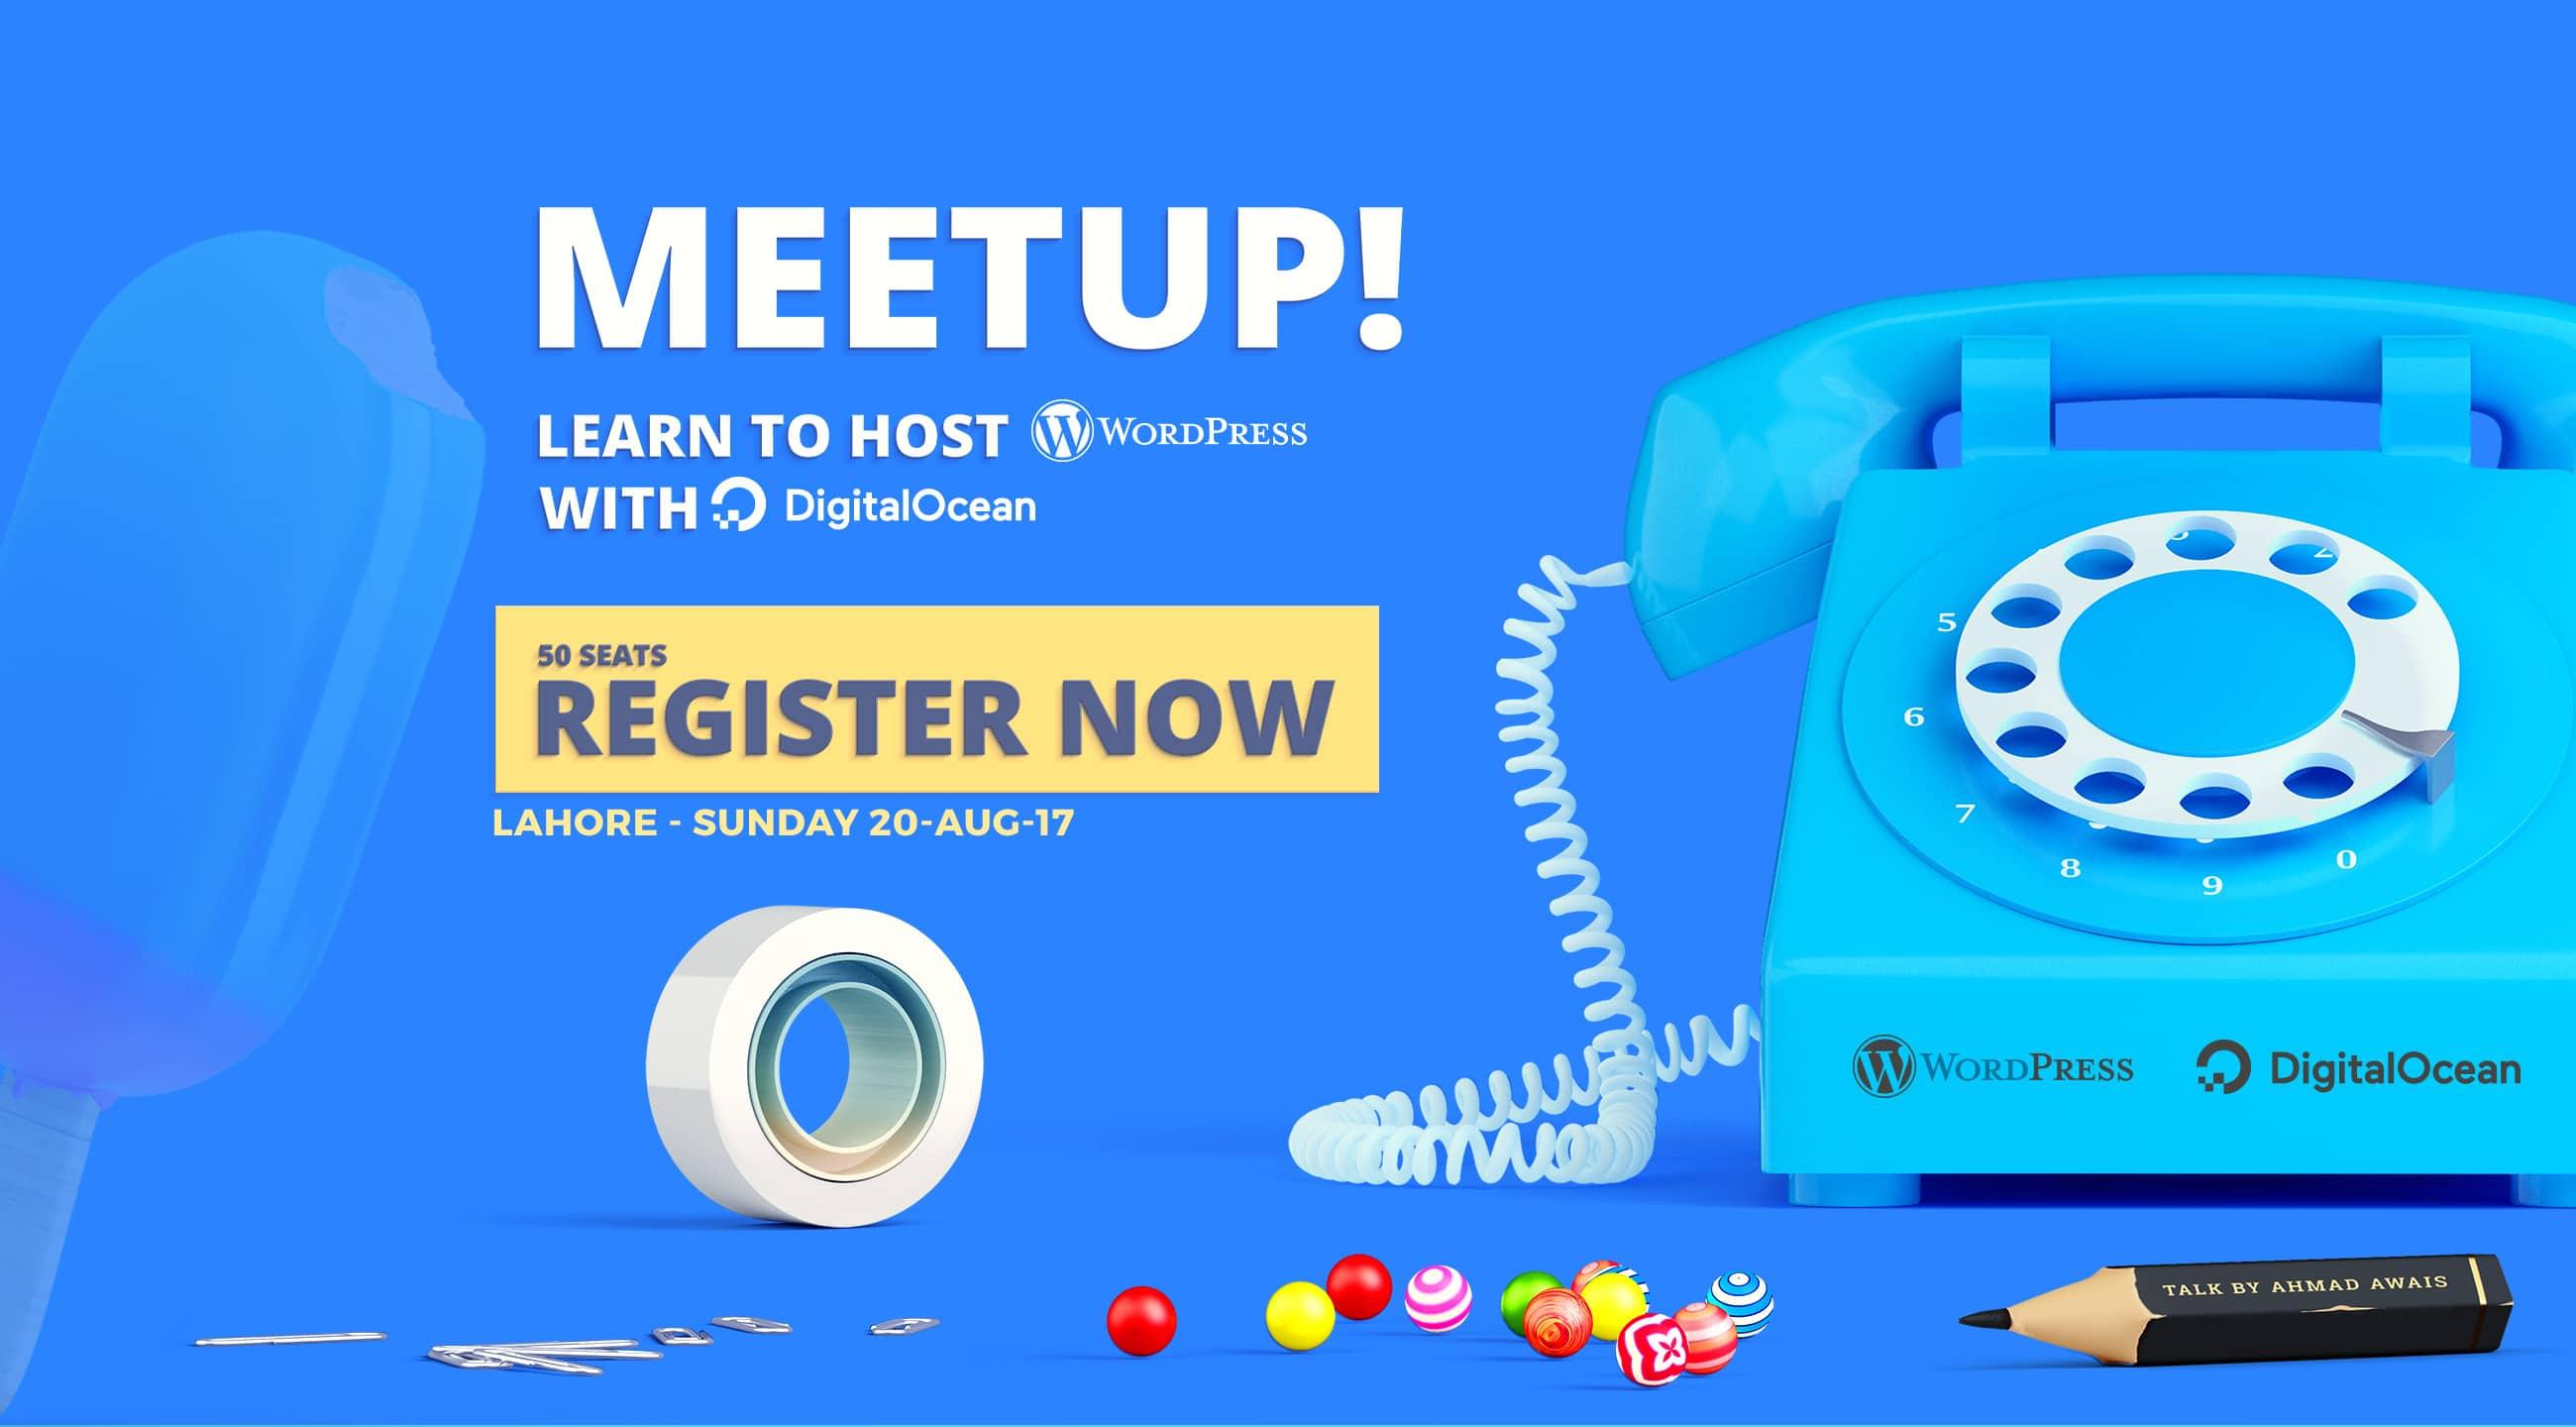 DigitalOcean + WordPress Meetup